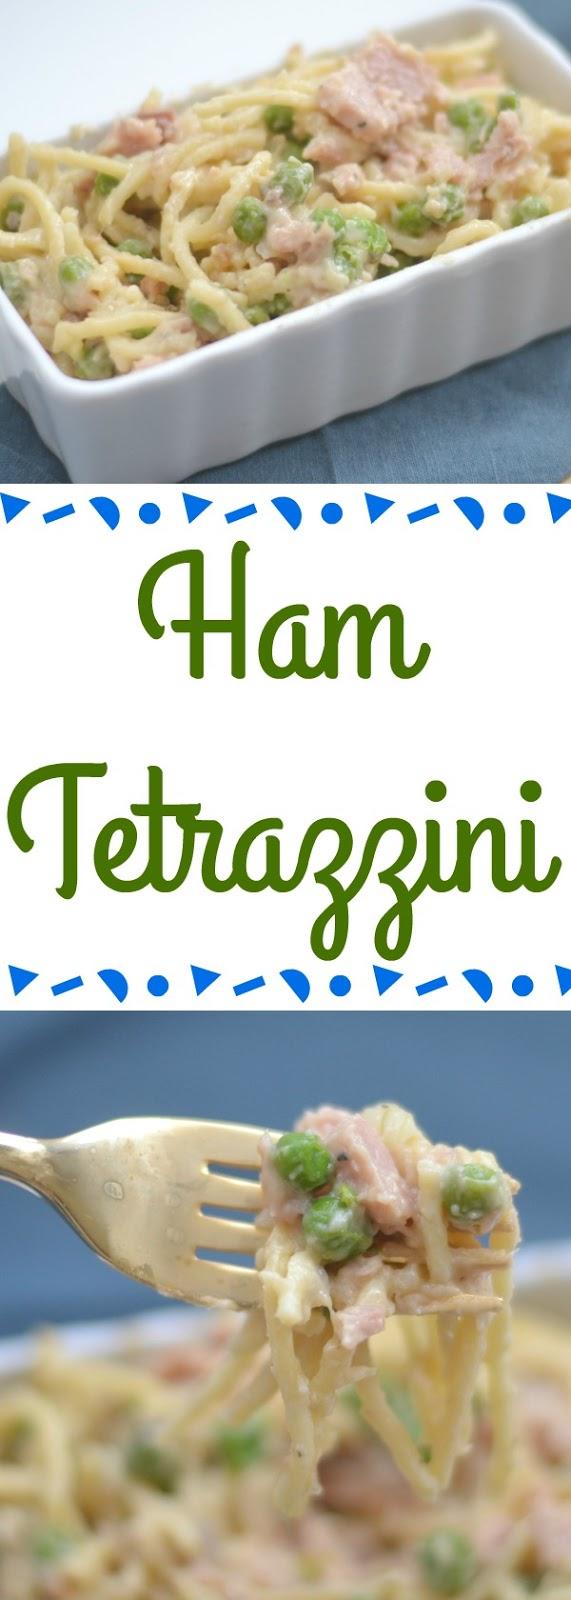 Ham Tetrazzini Building Our Story